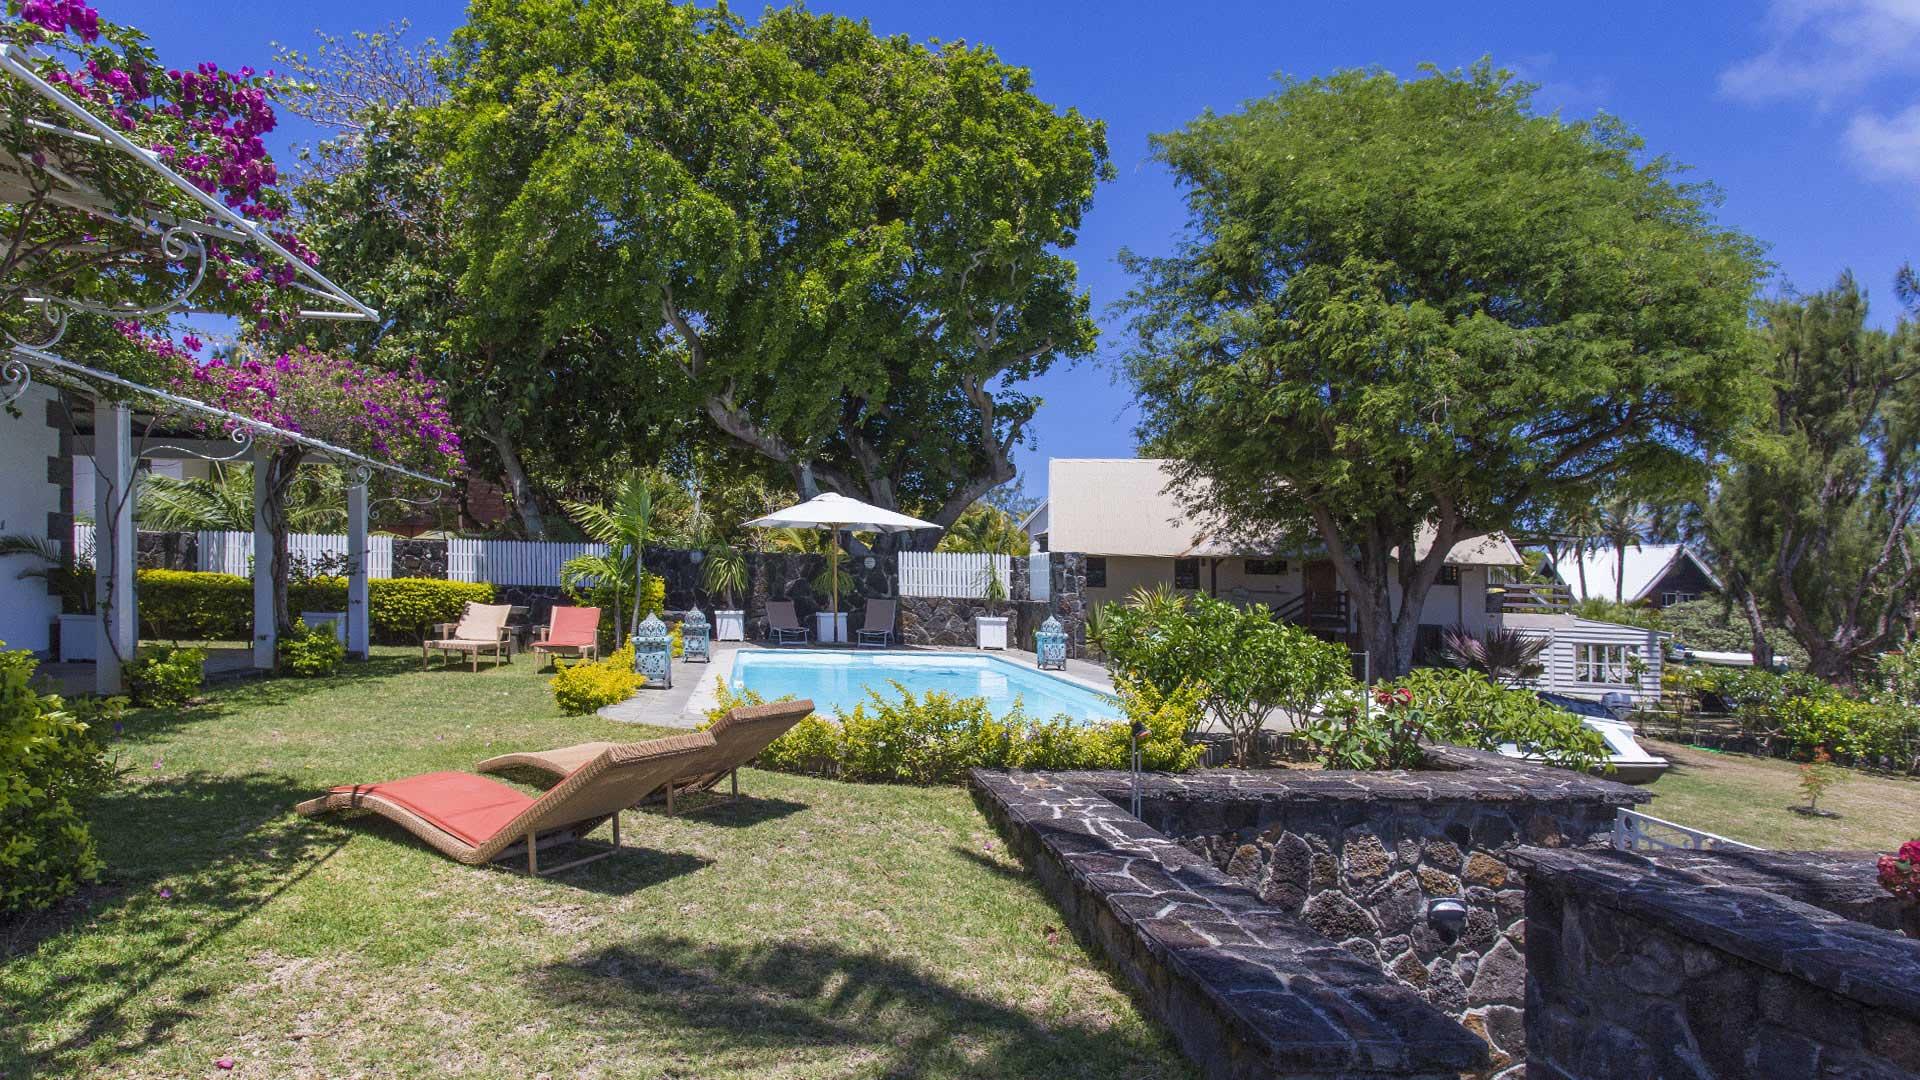 villa clusia villa mieten in mauritius norden cap malheureux villanovo. Black Bedroom Furniture Sets. Home Design Ideas